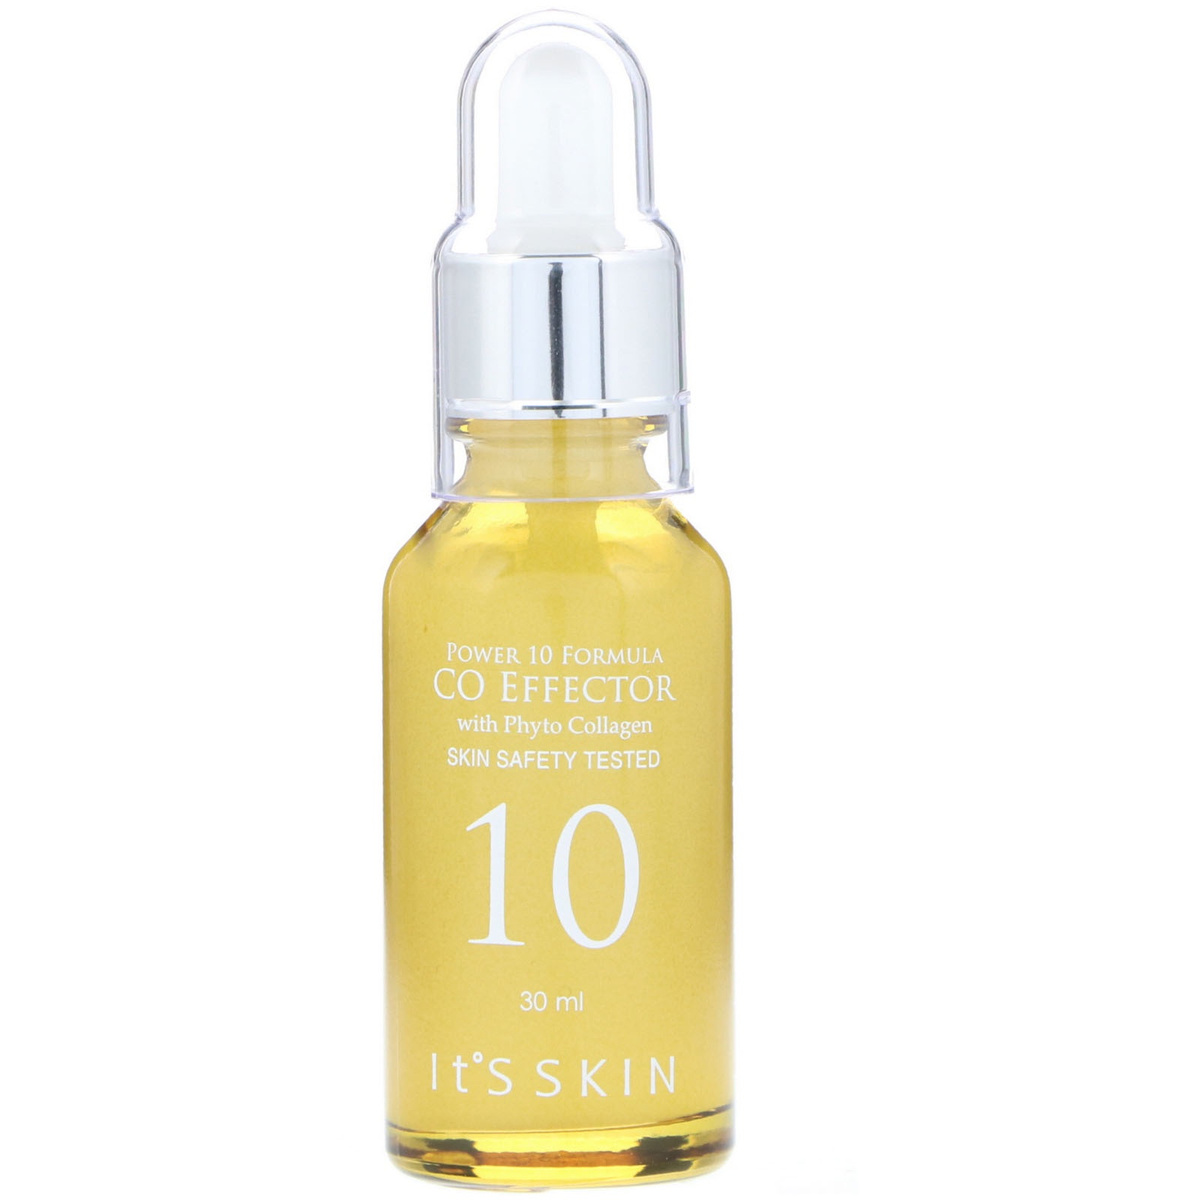 It's Skin Сыворотка с коллагеном Power 10 Formula CO Effector 30 мл #1